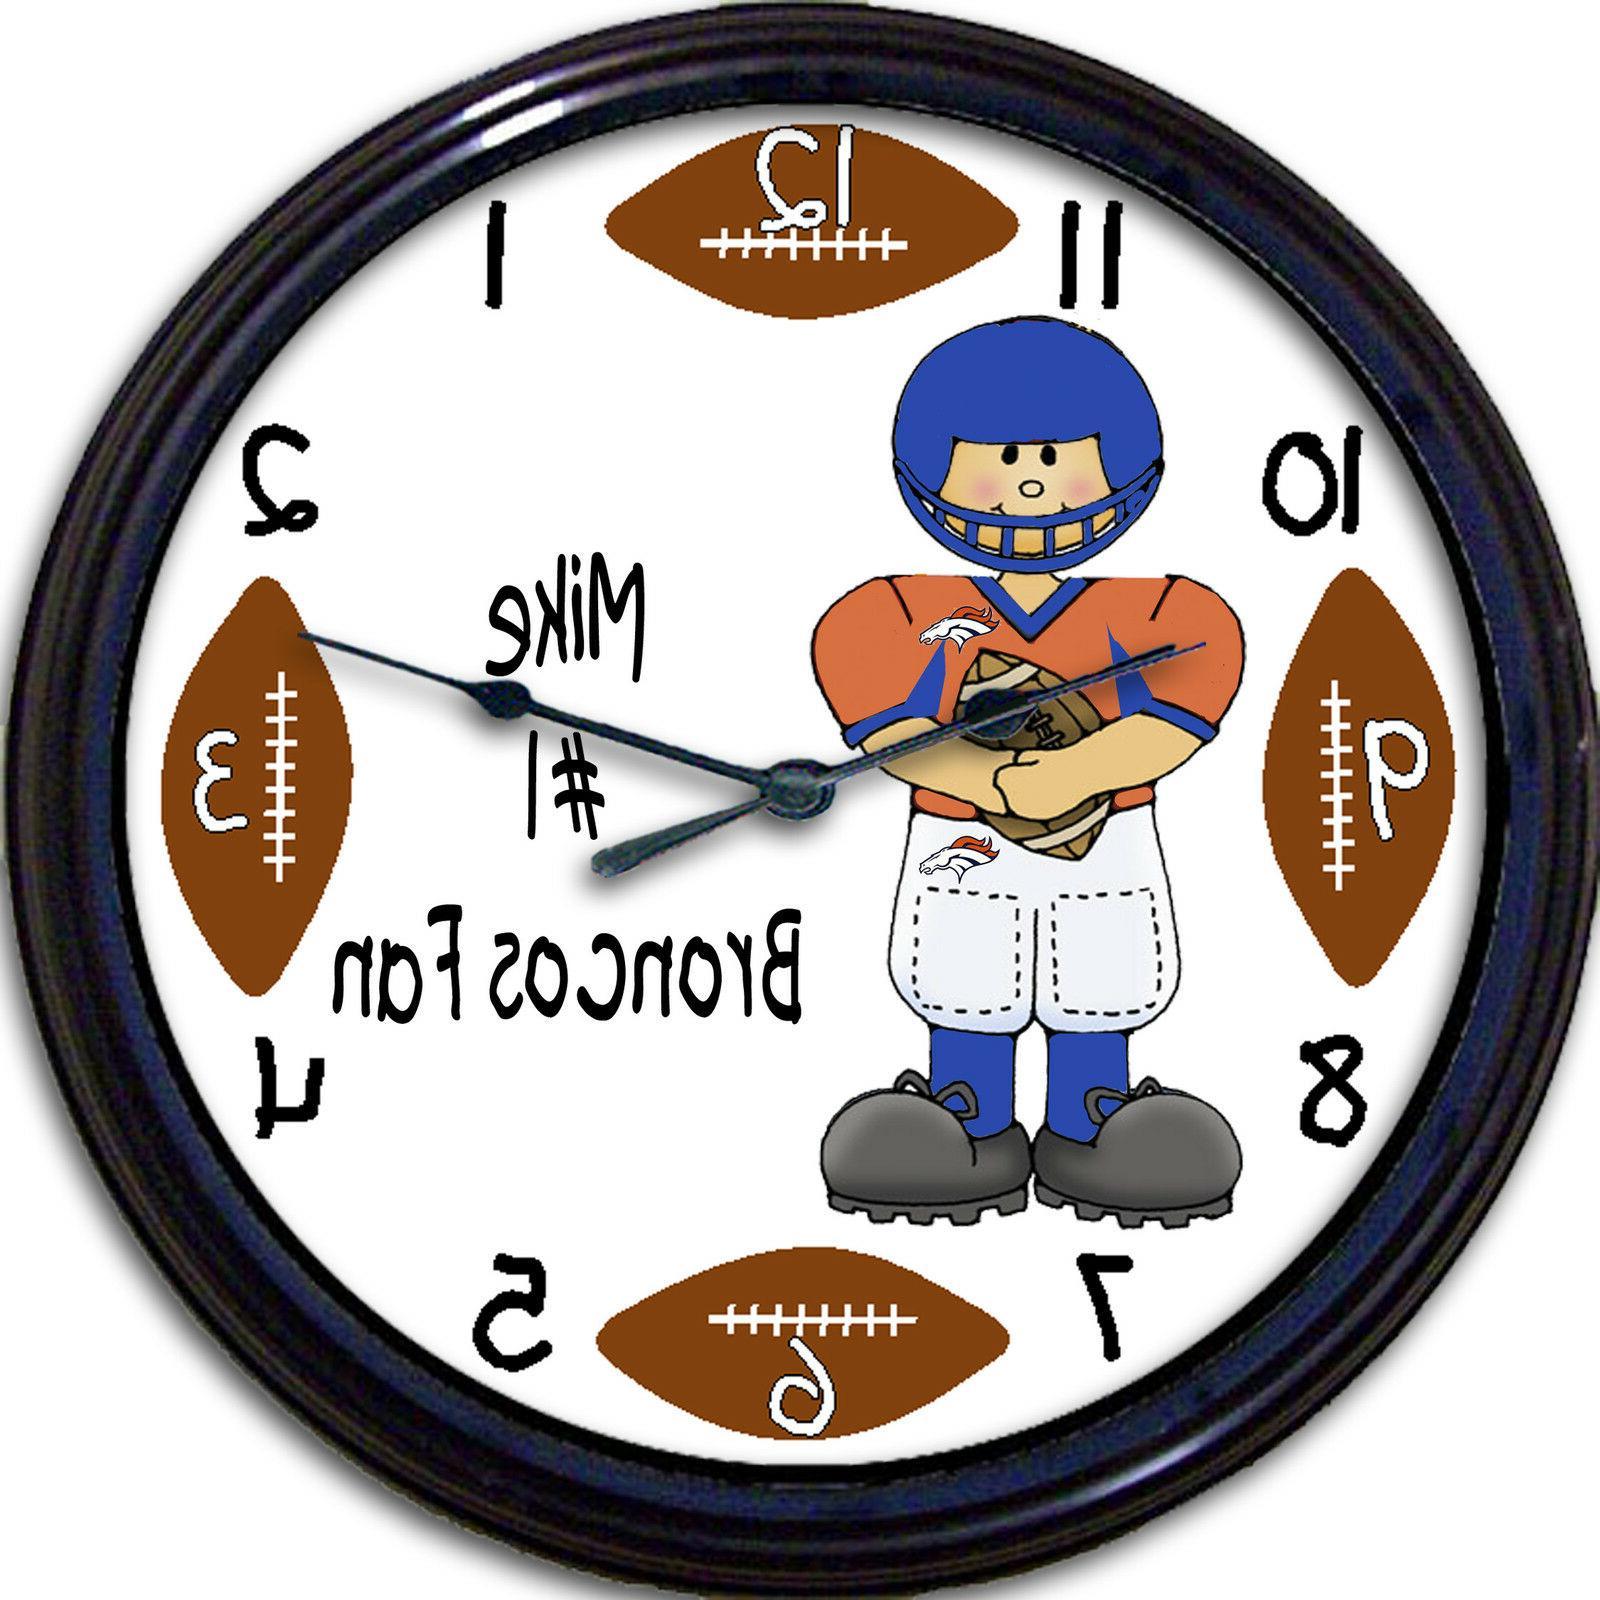 denver broncos personalized wall clock nfl football